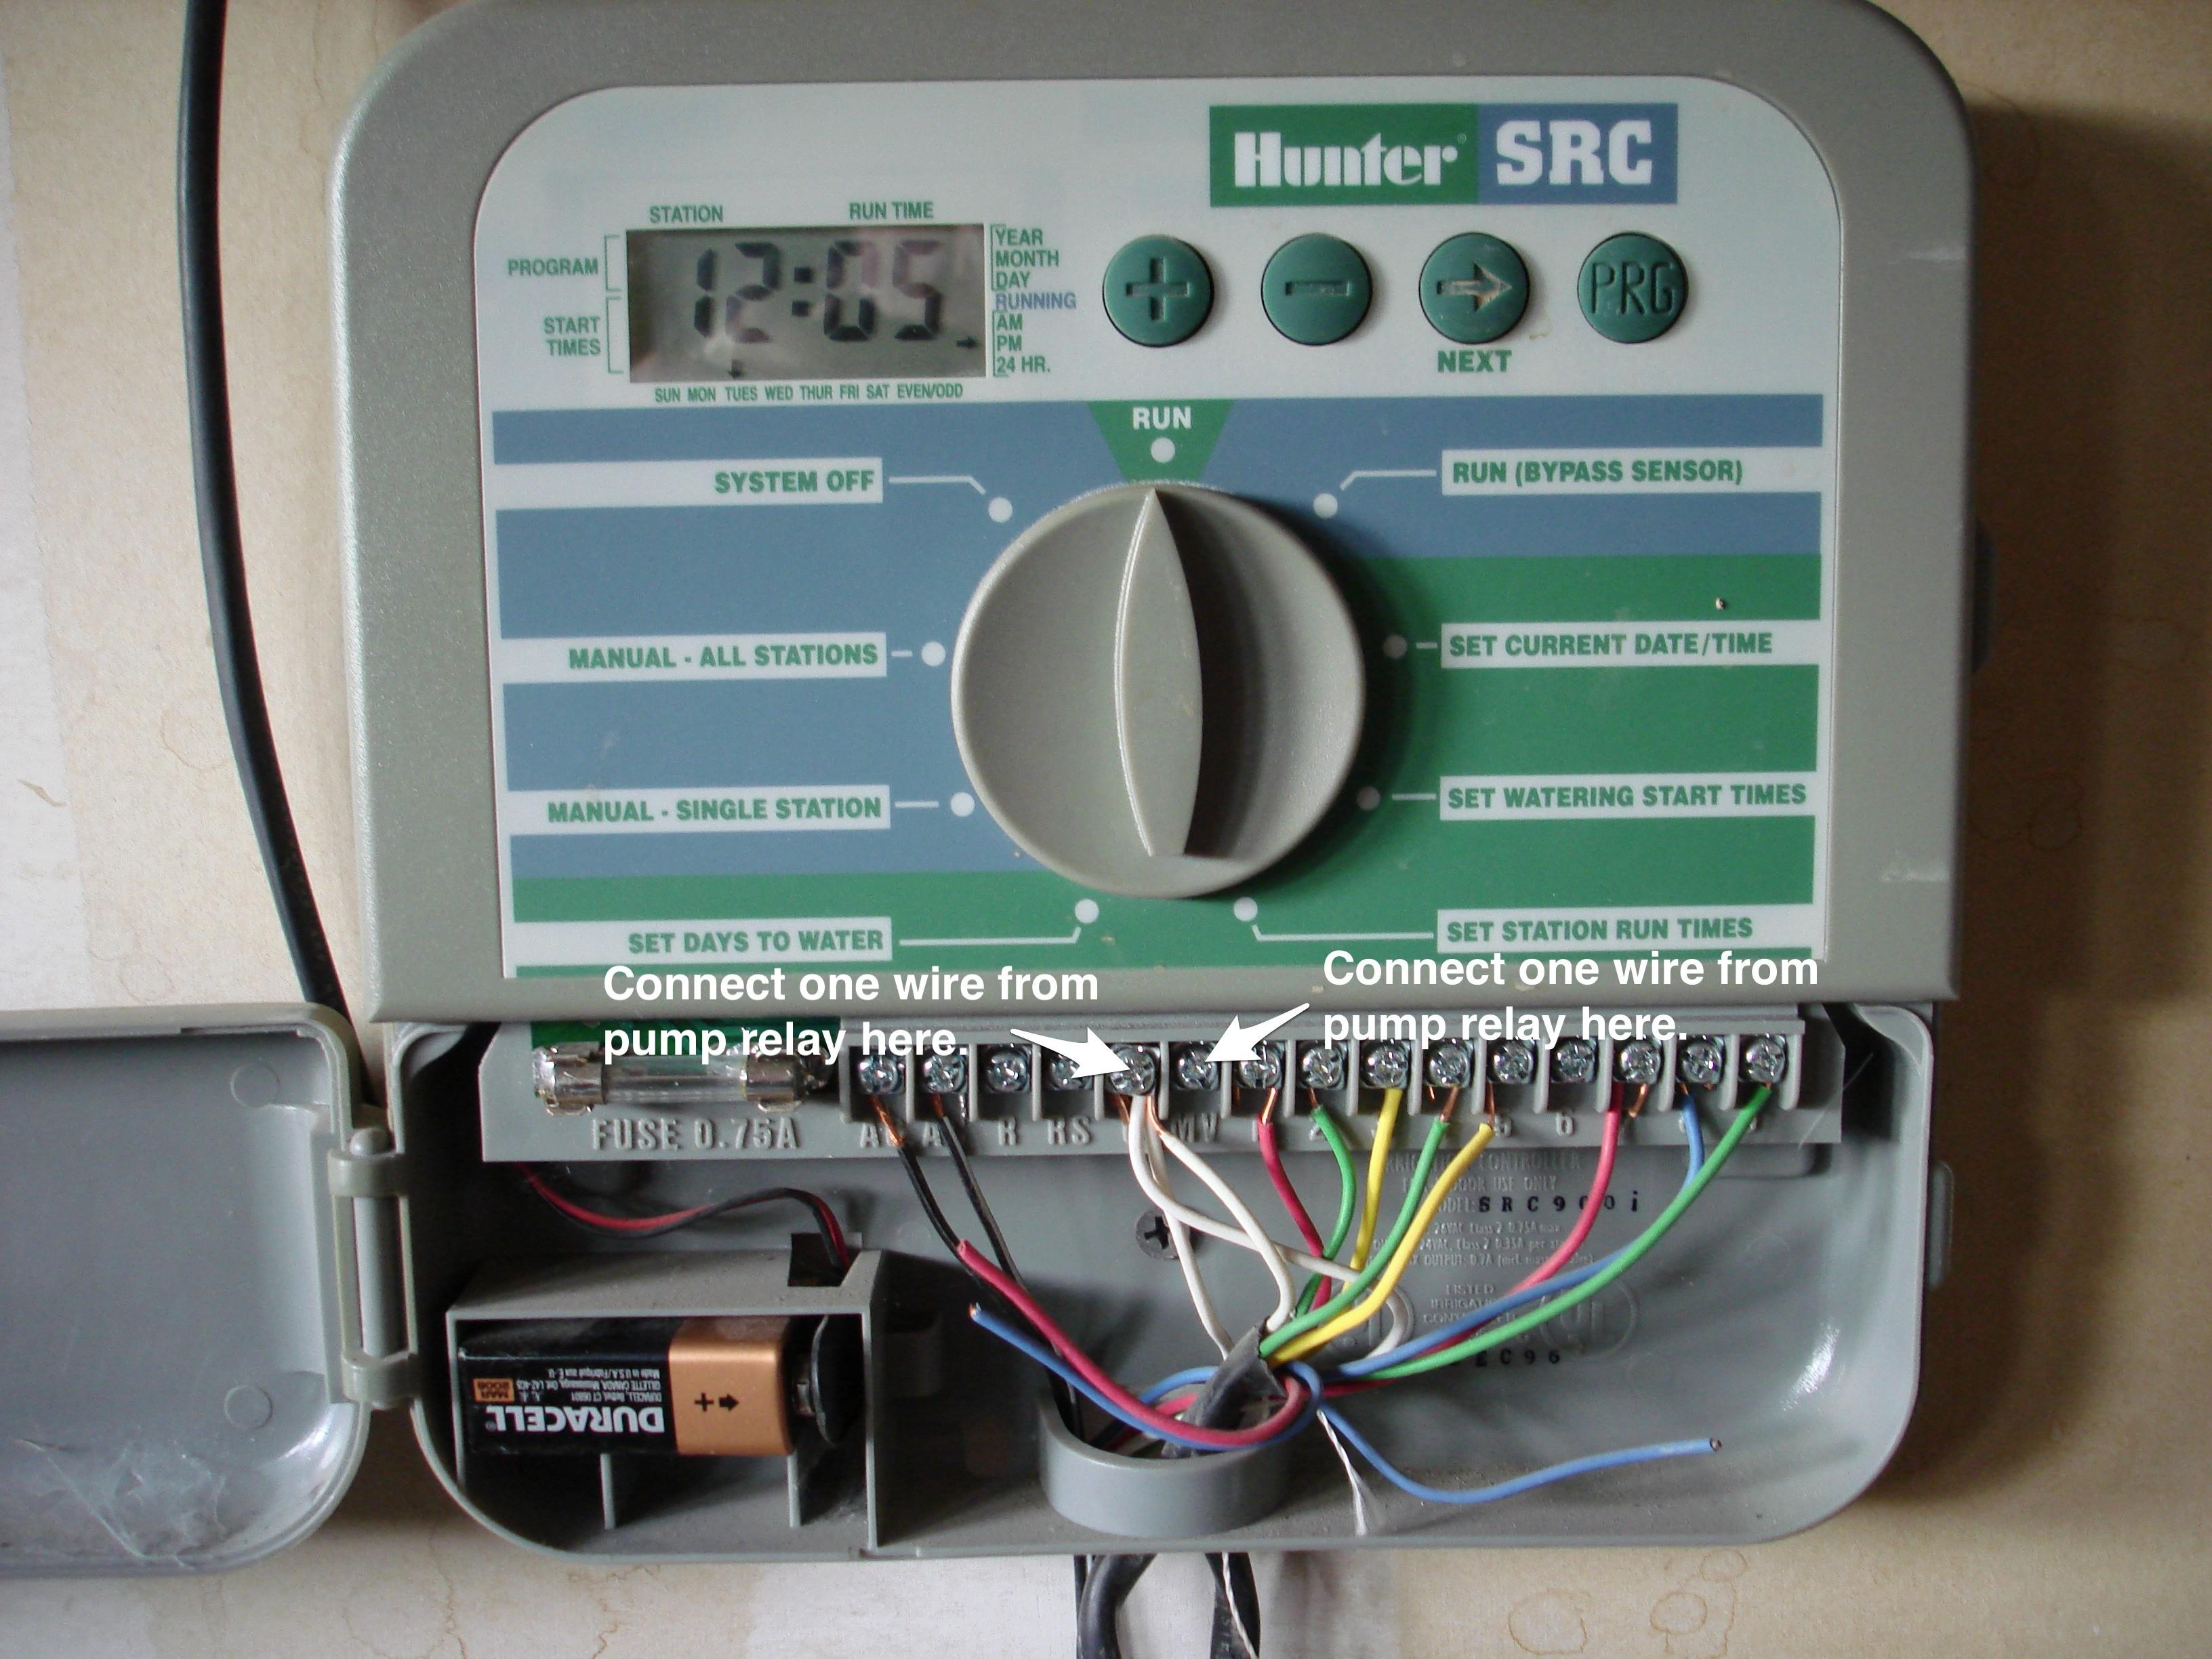 Orbit Pump Start Relay Instructions Sprinkler Master Pump Valve Wiring – iscaper Blog Of Orbit Pump Start Relay Instructions